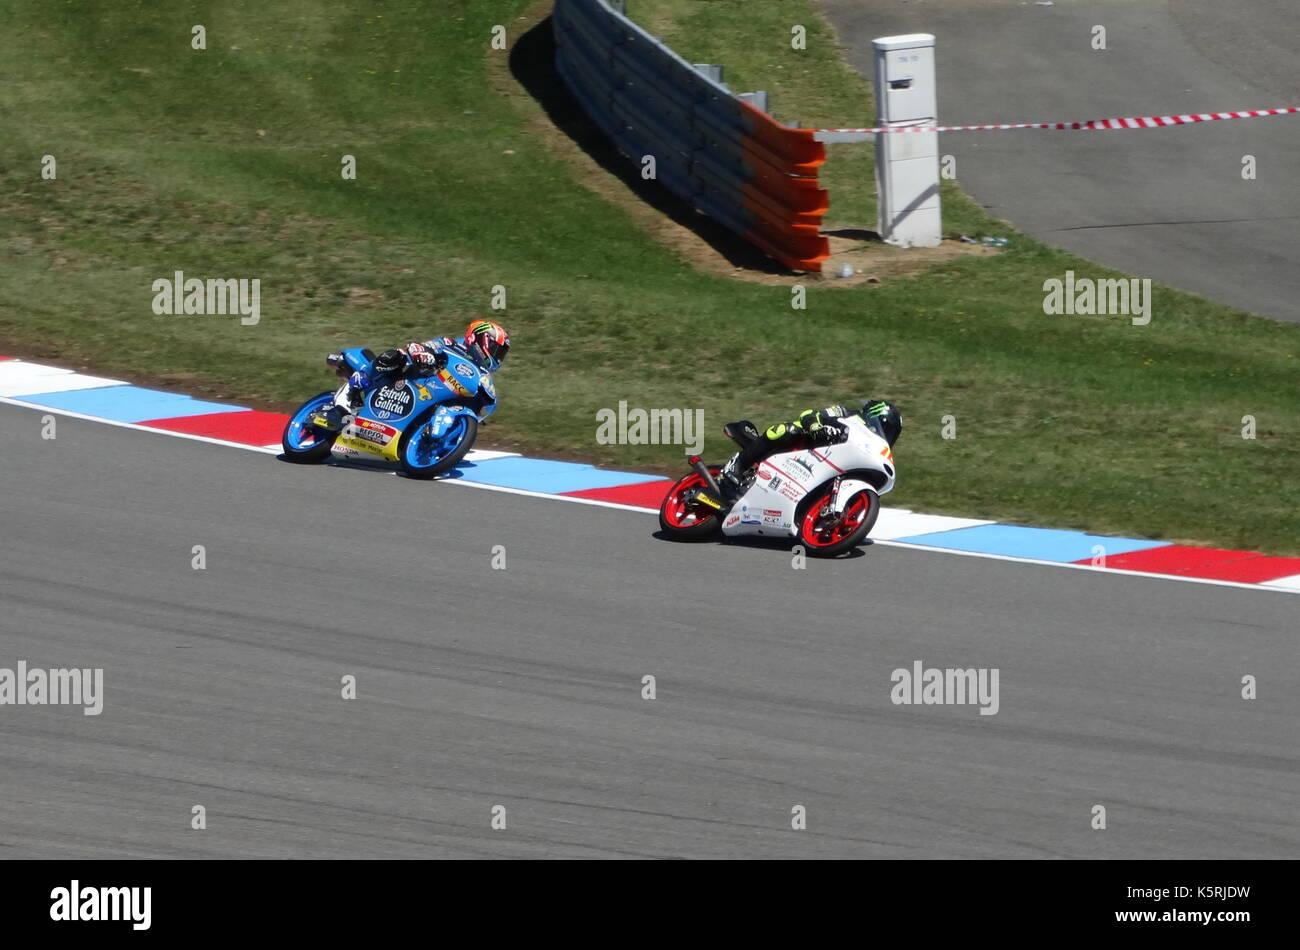 Moto Gp Track Stock Photos & Moto Gp Track Stock Images - Alamy